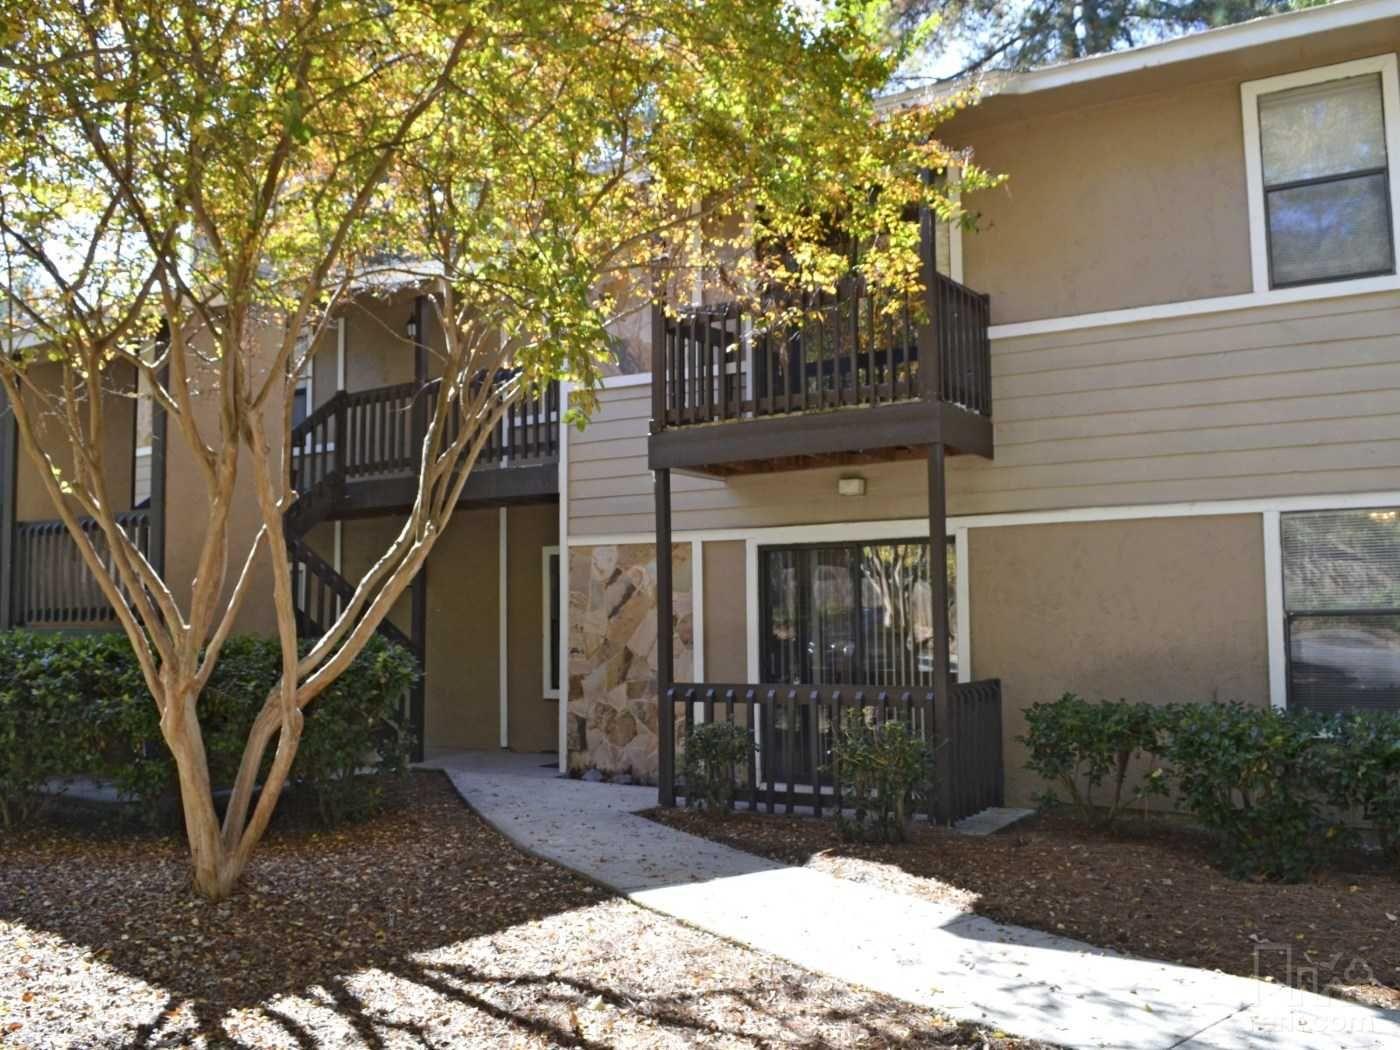 Shenandoah Ridge Blue Ridge Drive Martinez Ga Apartments For Rent Rent Com Apartments For Rent Apartment Shenandoah